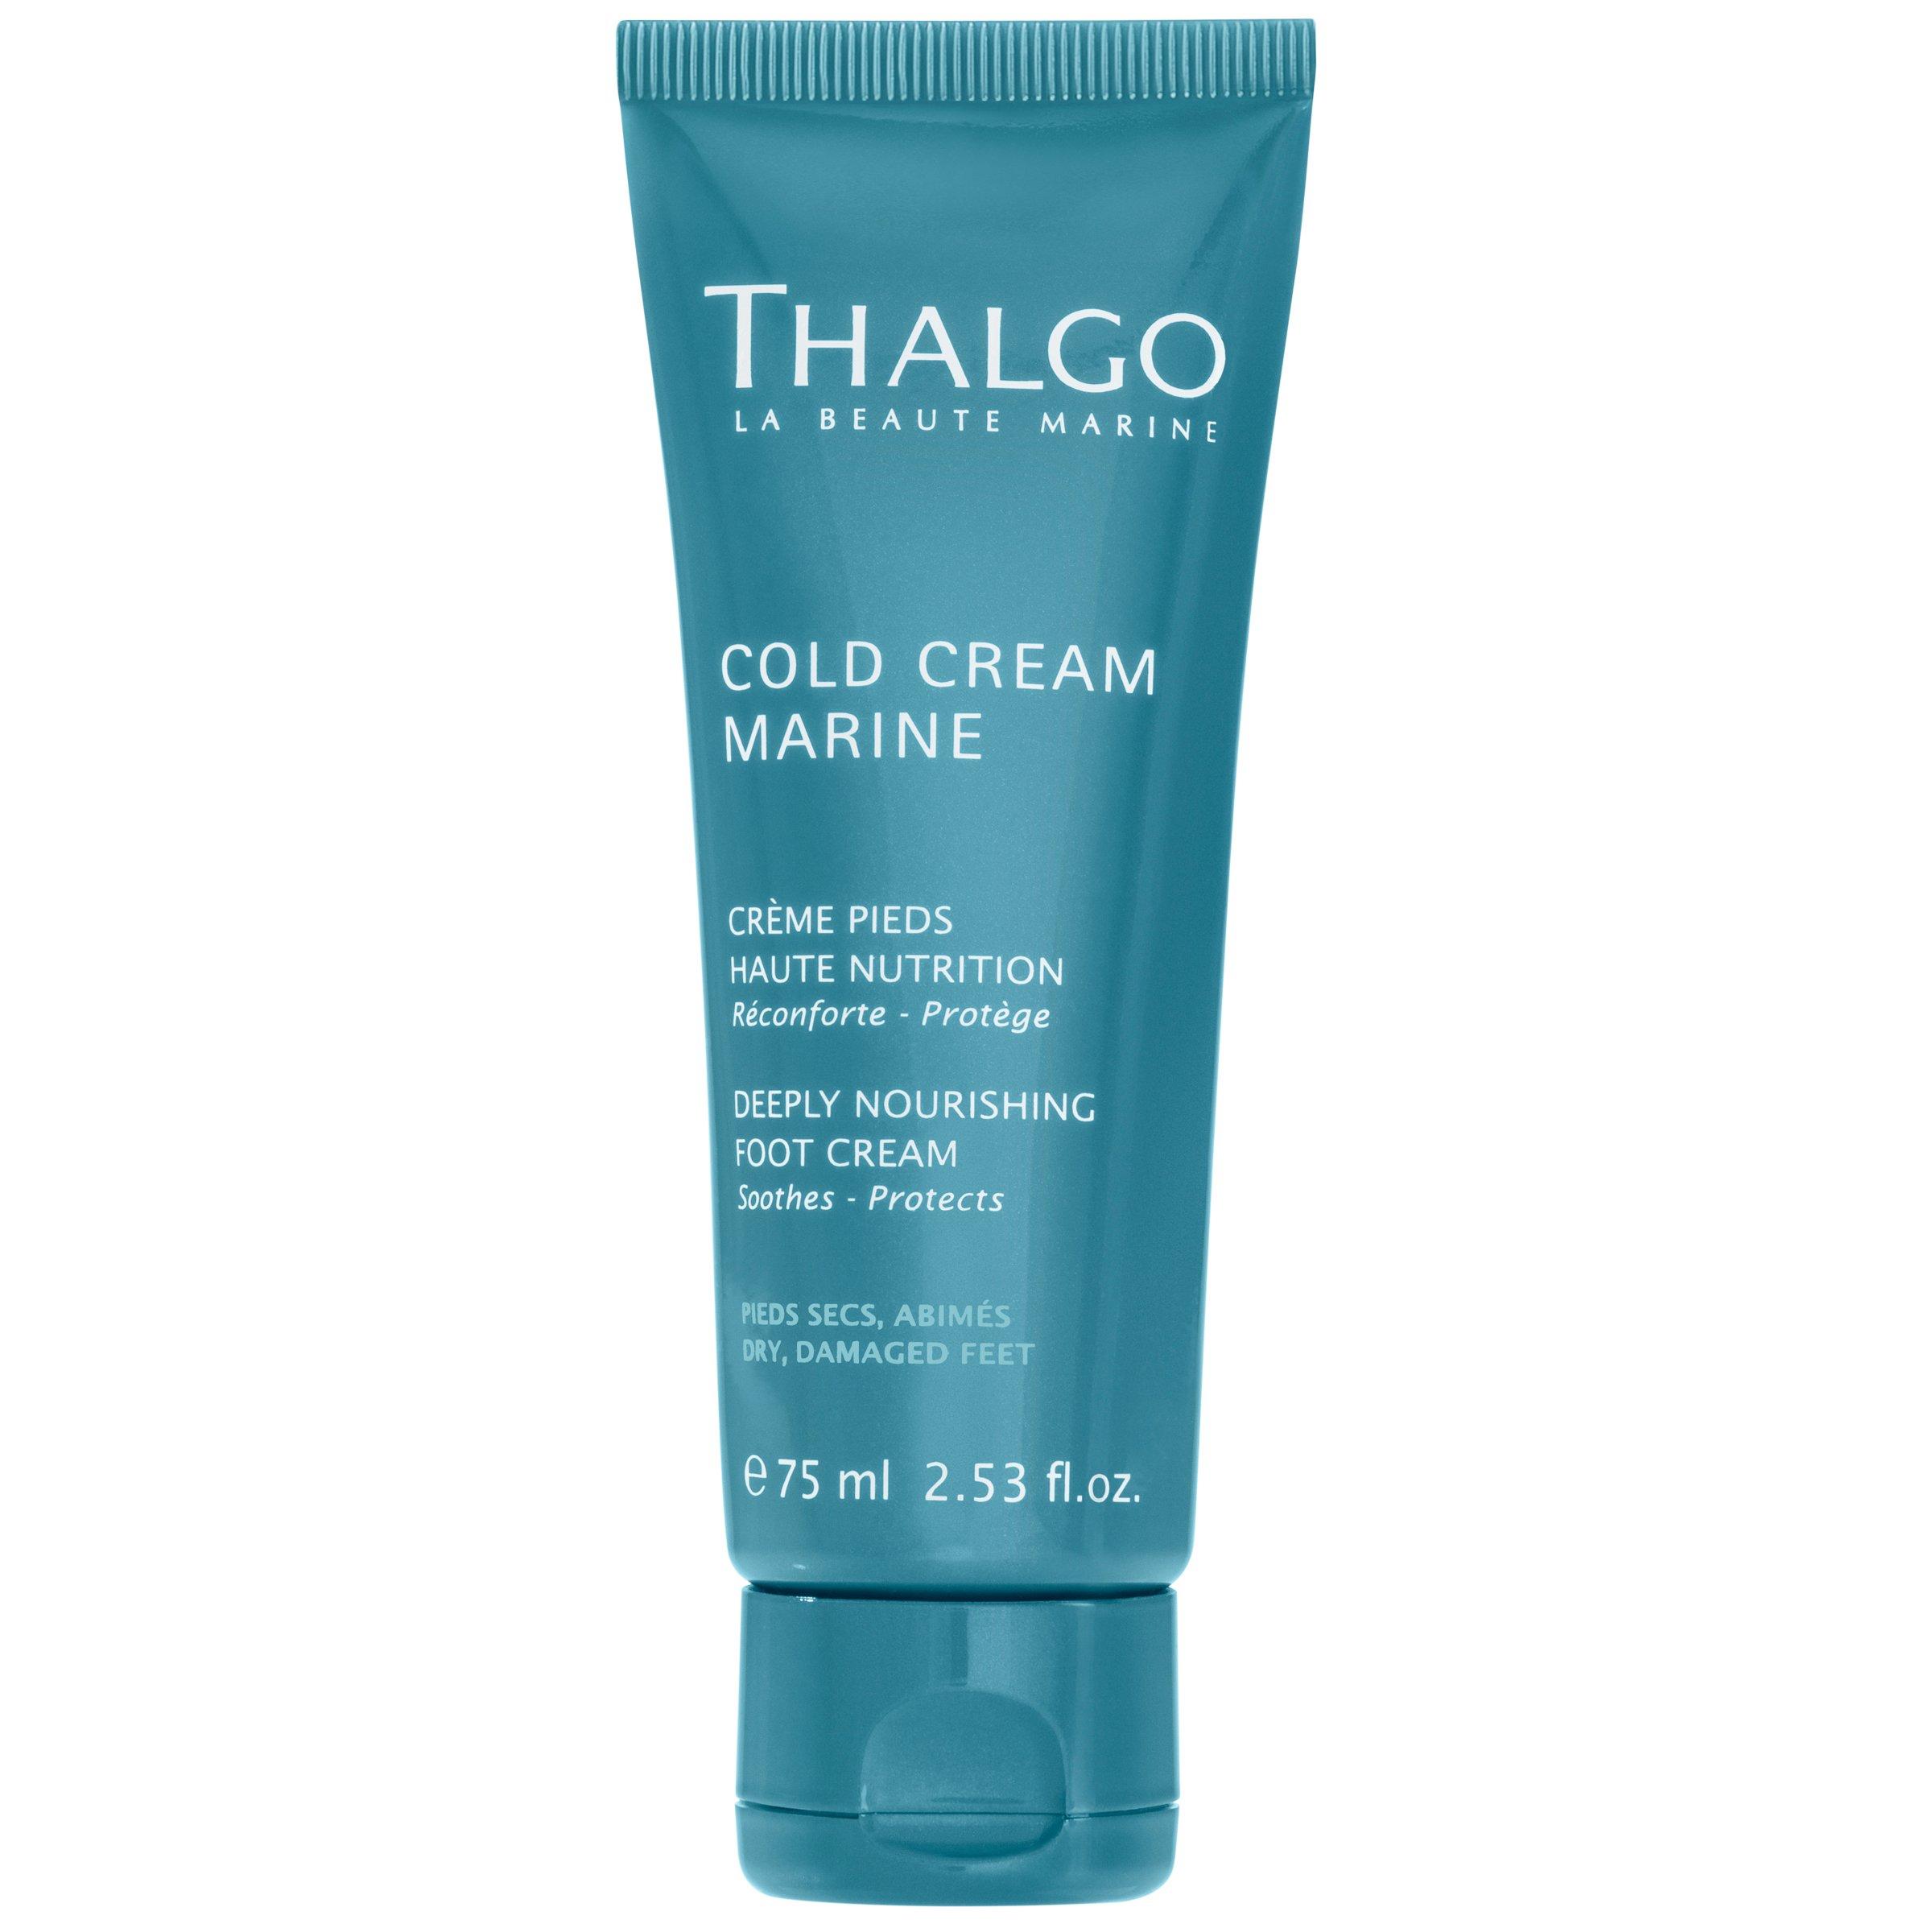 Thalgo Deeply Nourishing Foot Cream, 2.53605 Fluid Ounce